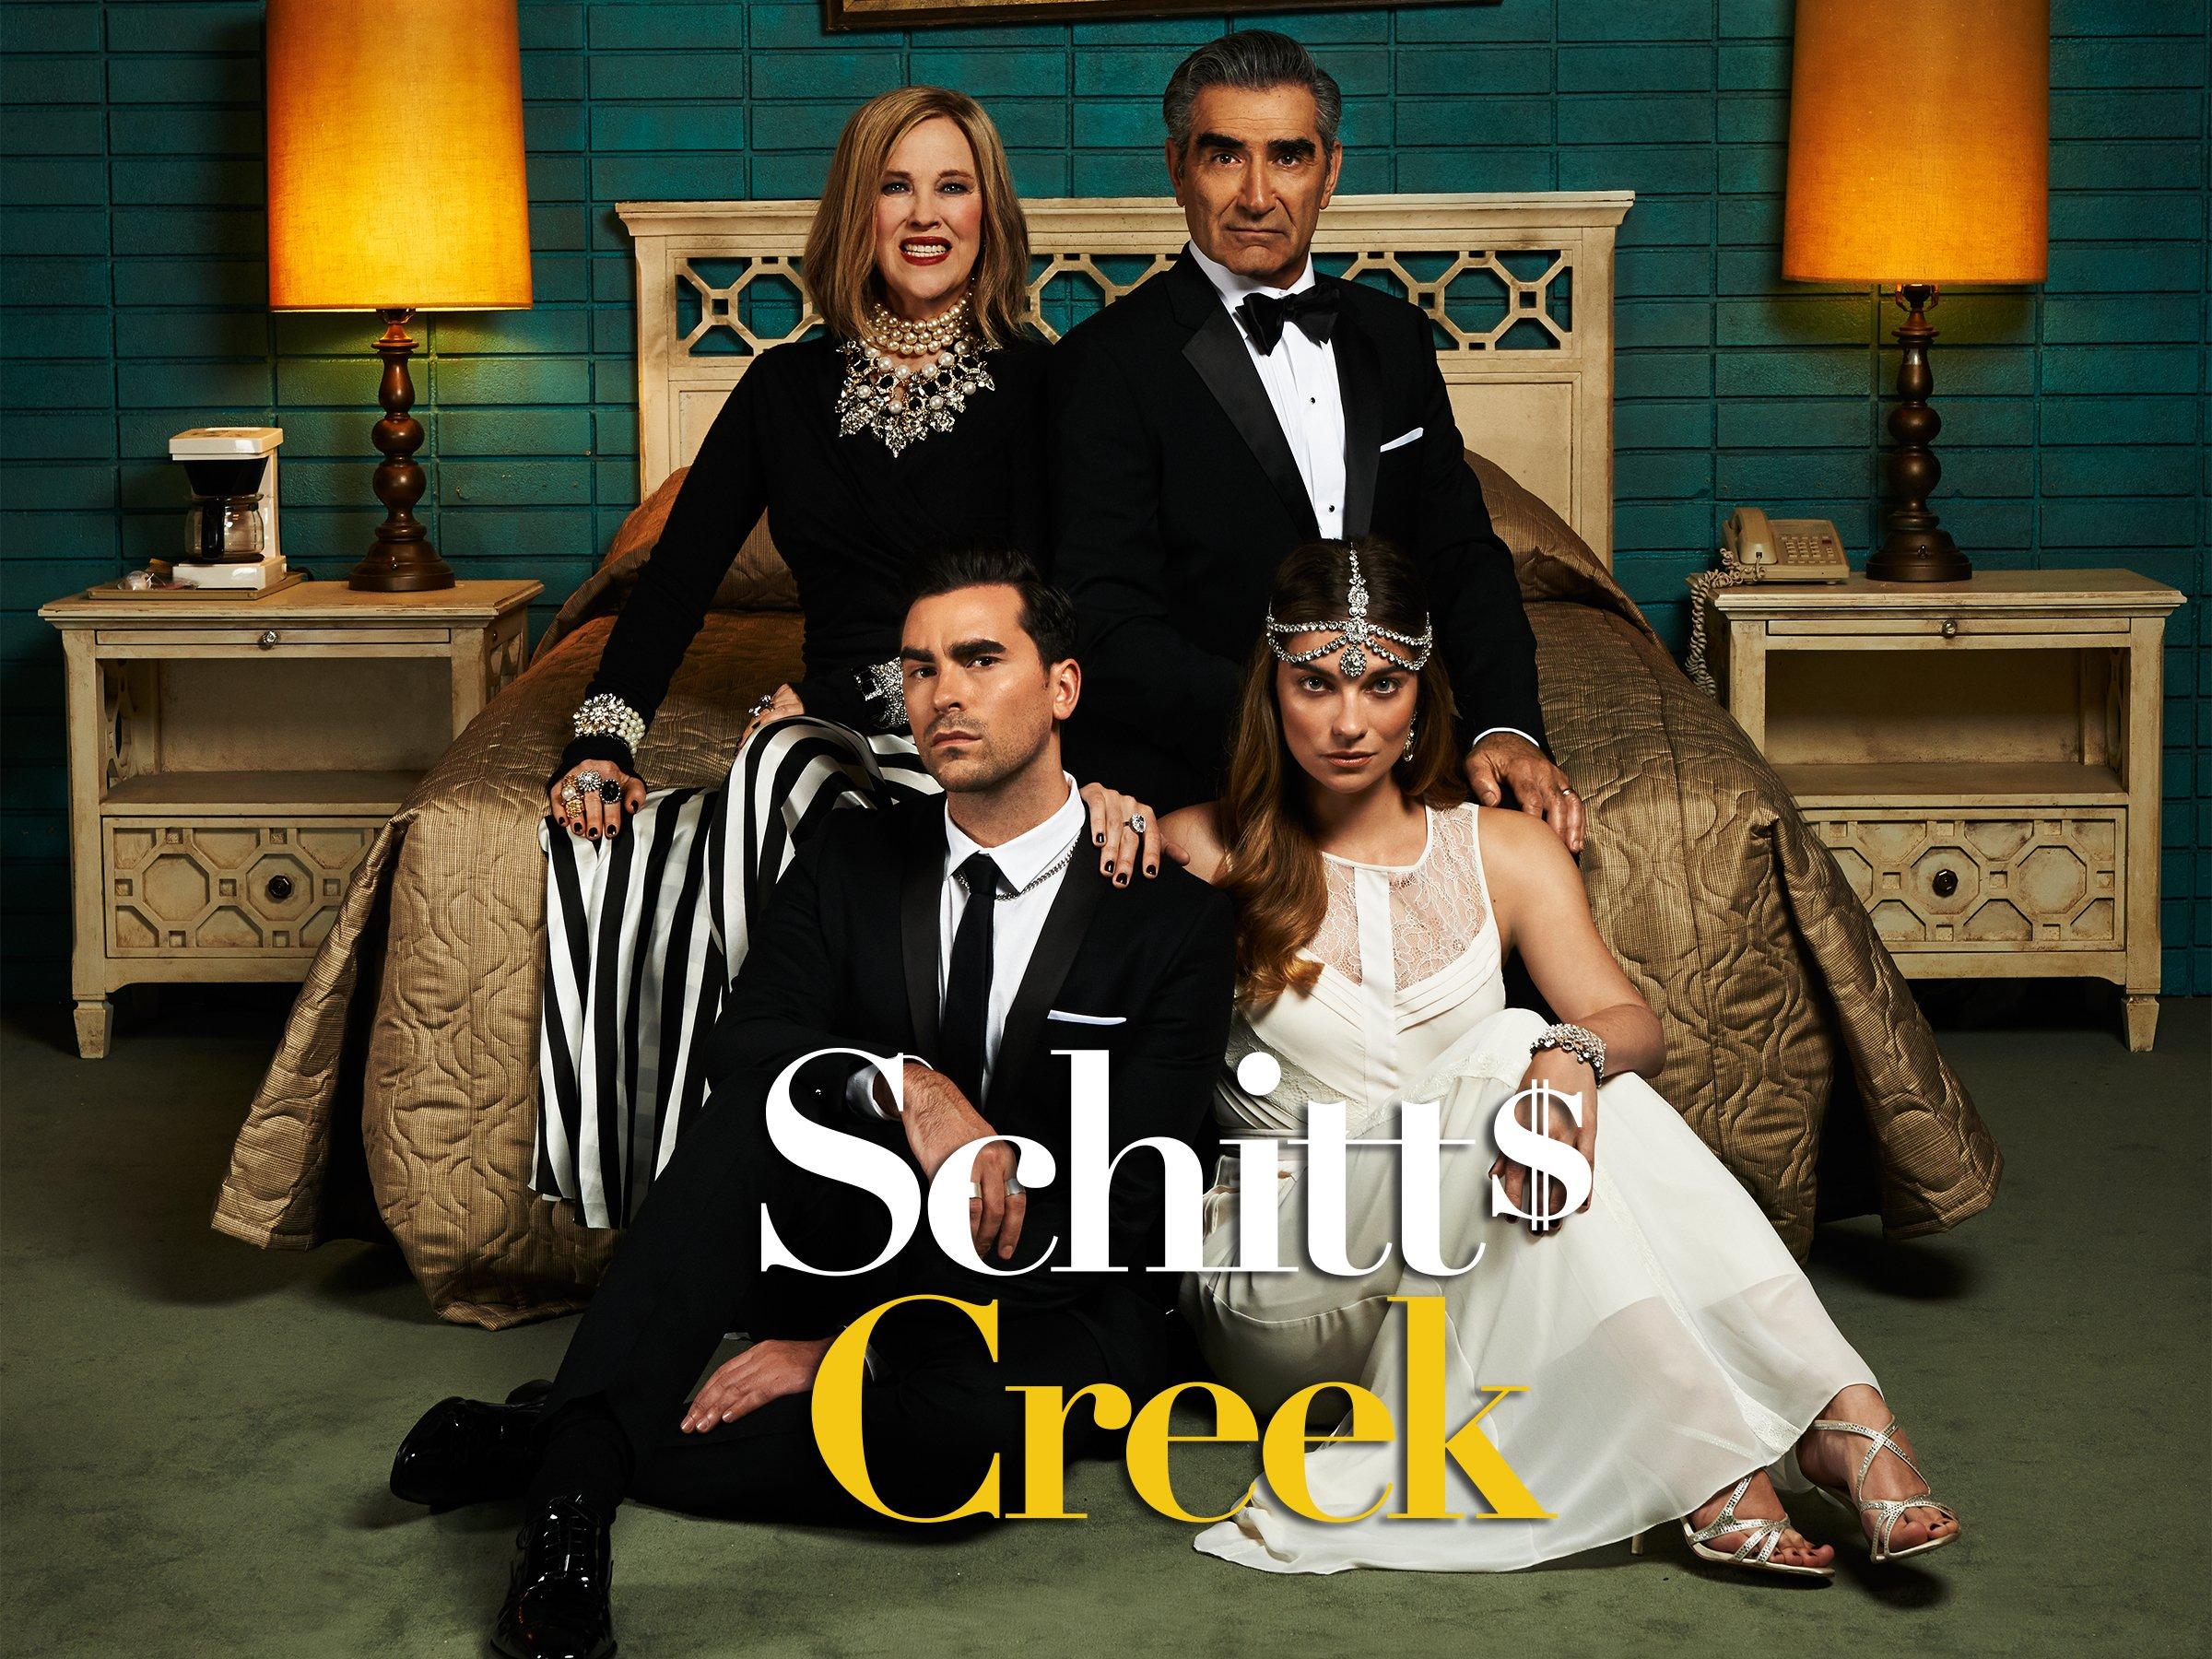 Schitts Creek Christmas Special.Watch Schitt S Creek Season 4 Prime Video